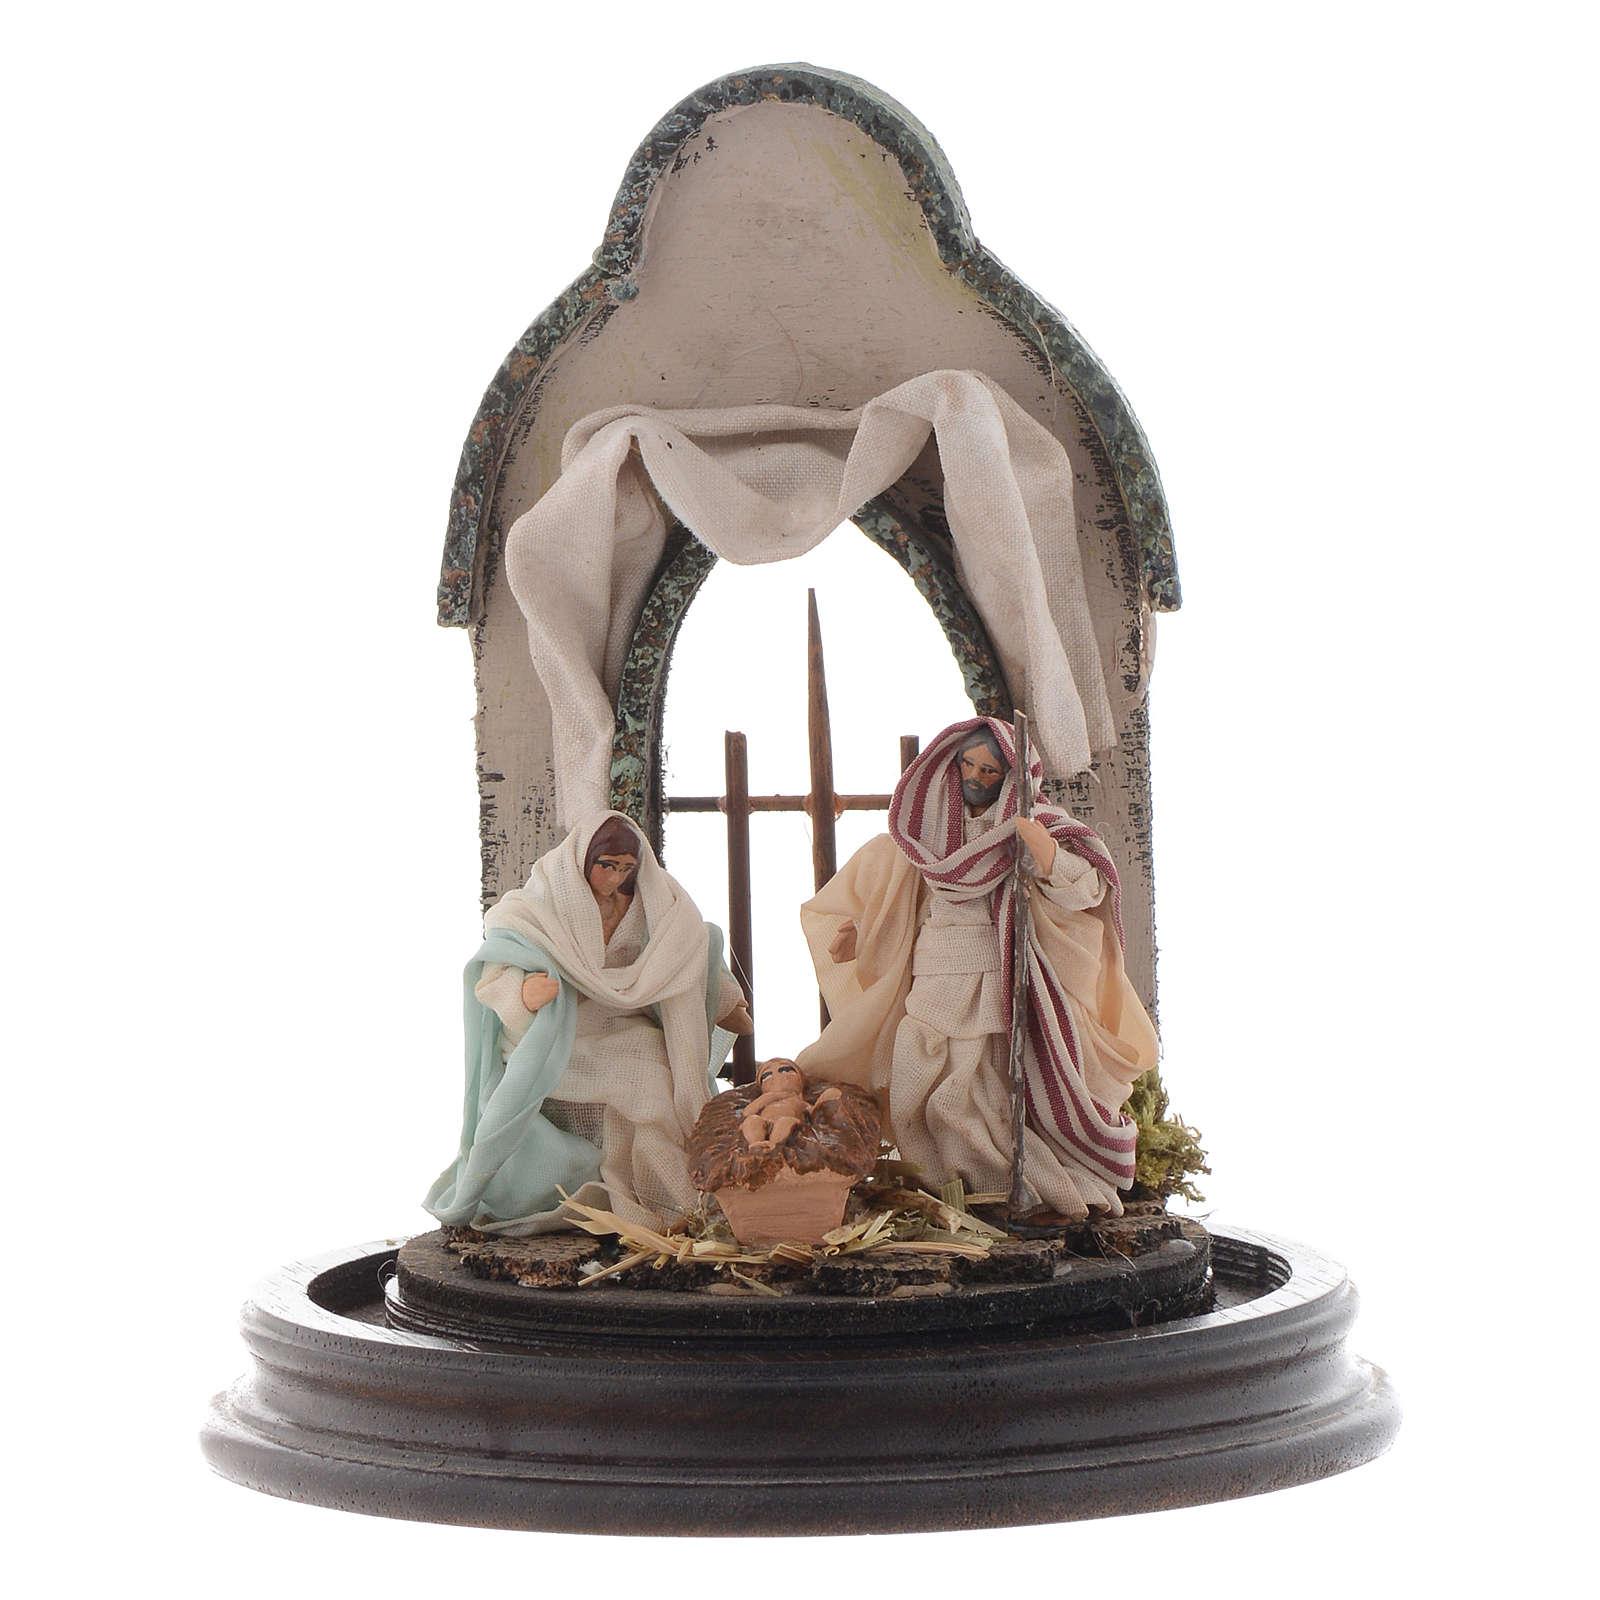 Escena Natividad 20x15 cm cúpula vidrio estilo árabe pesebre napolitano 4